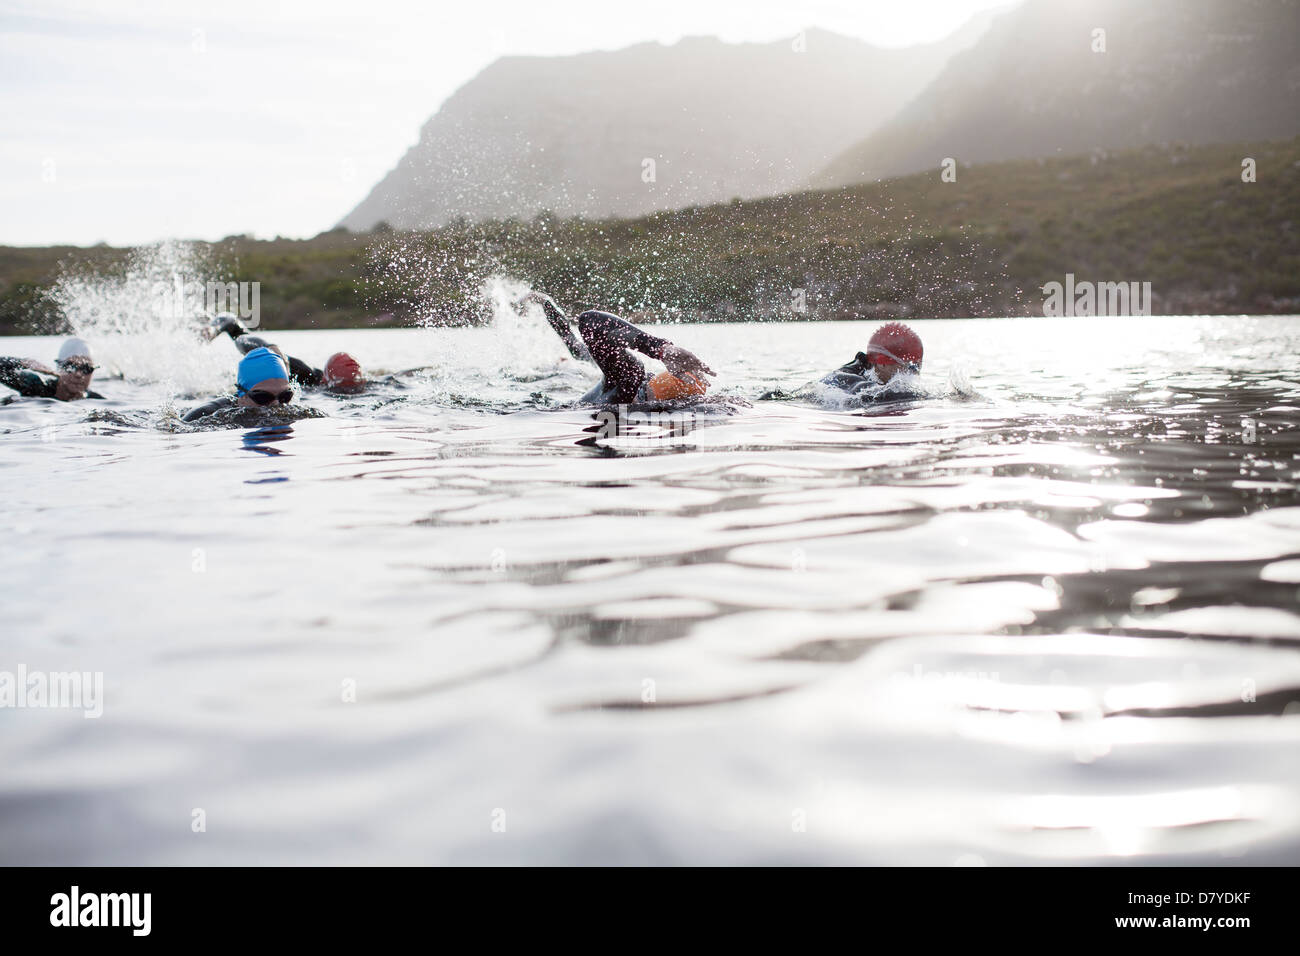 Triathletes swimming - Stock Image